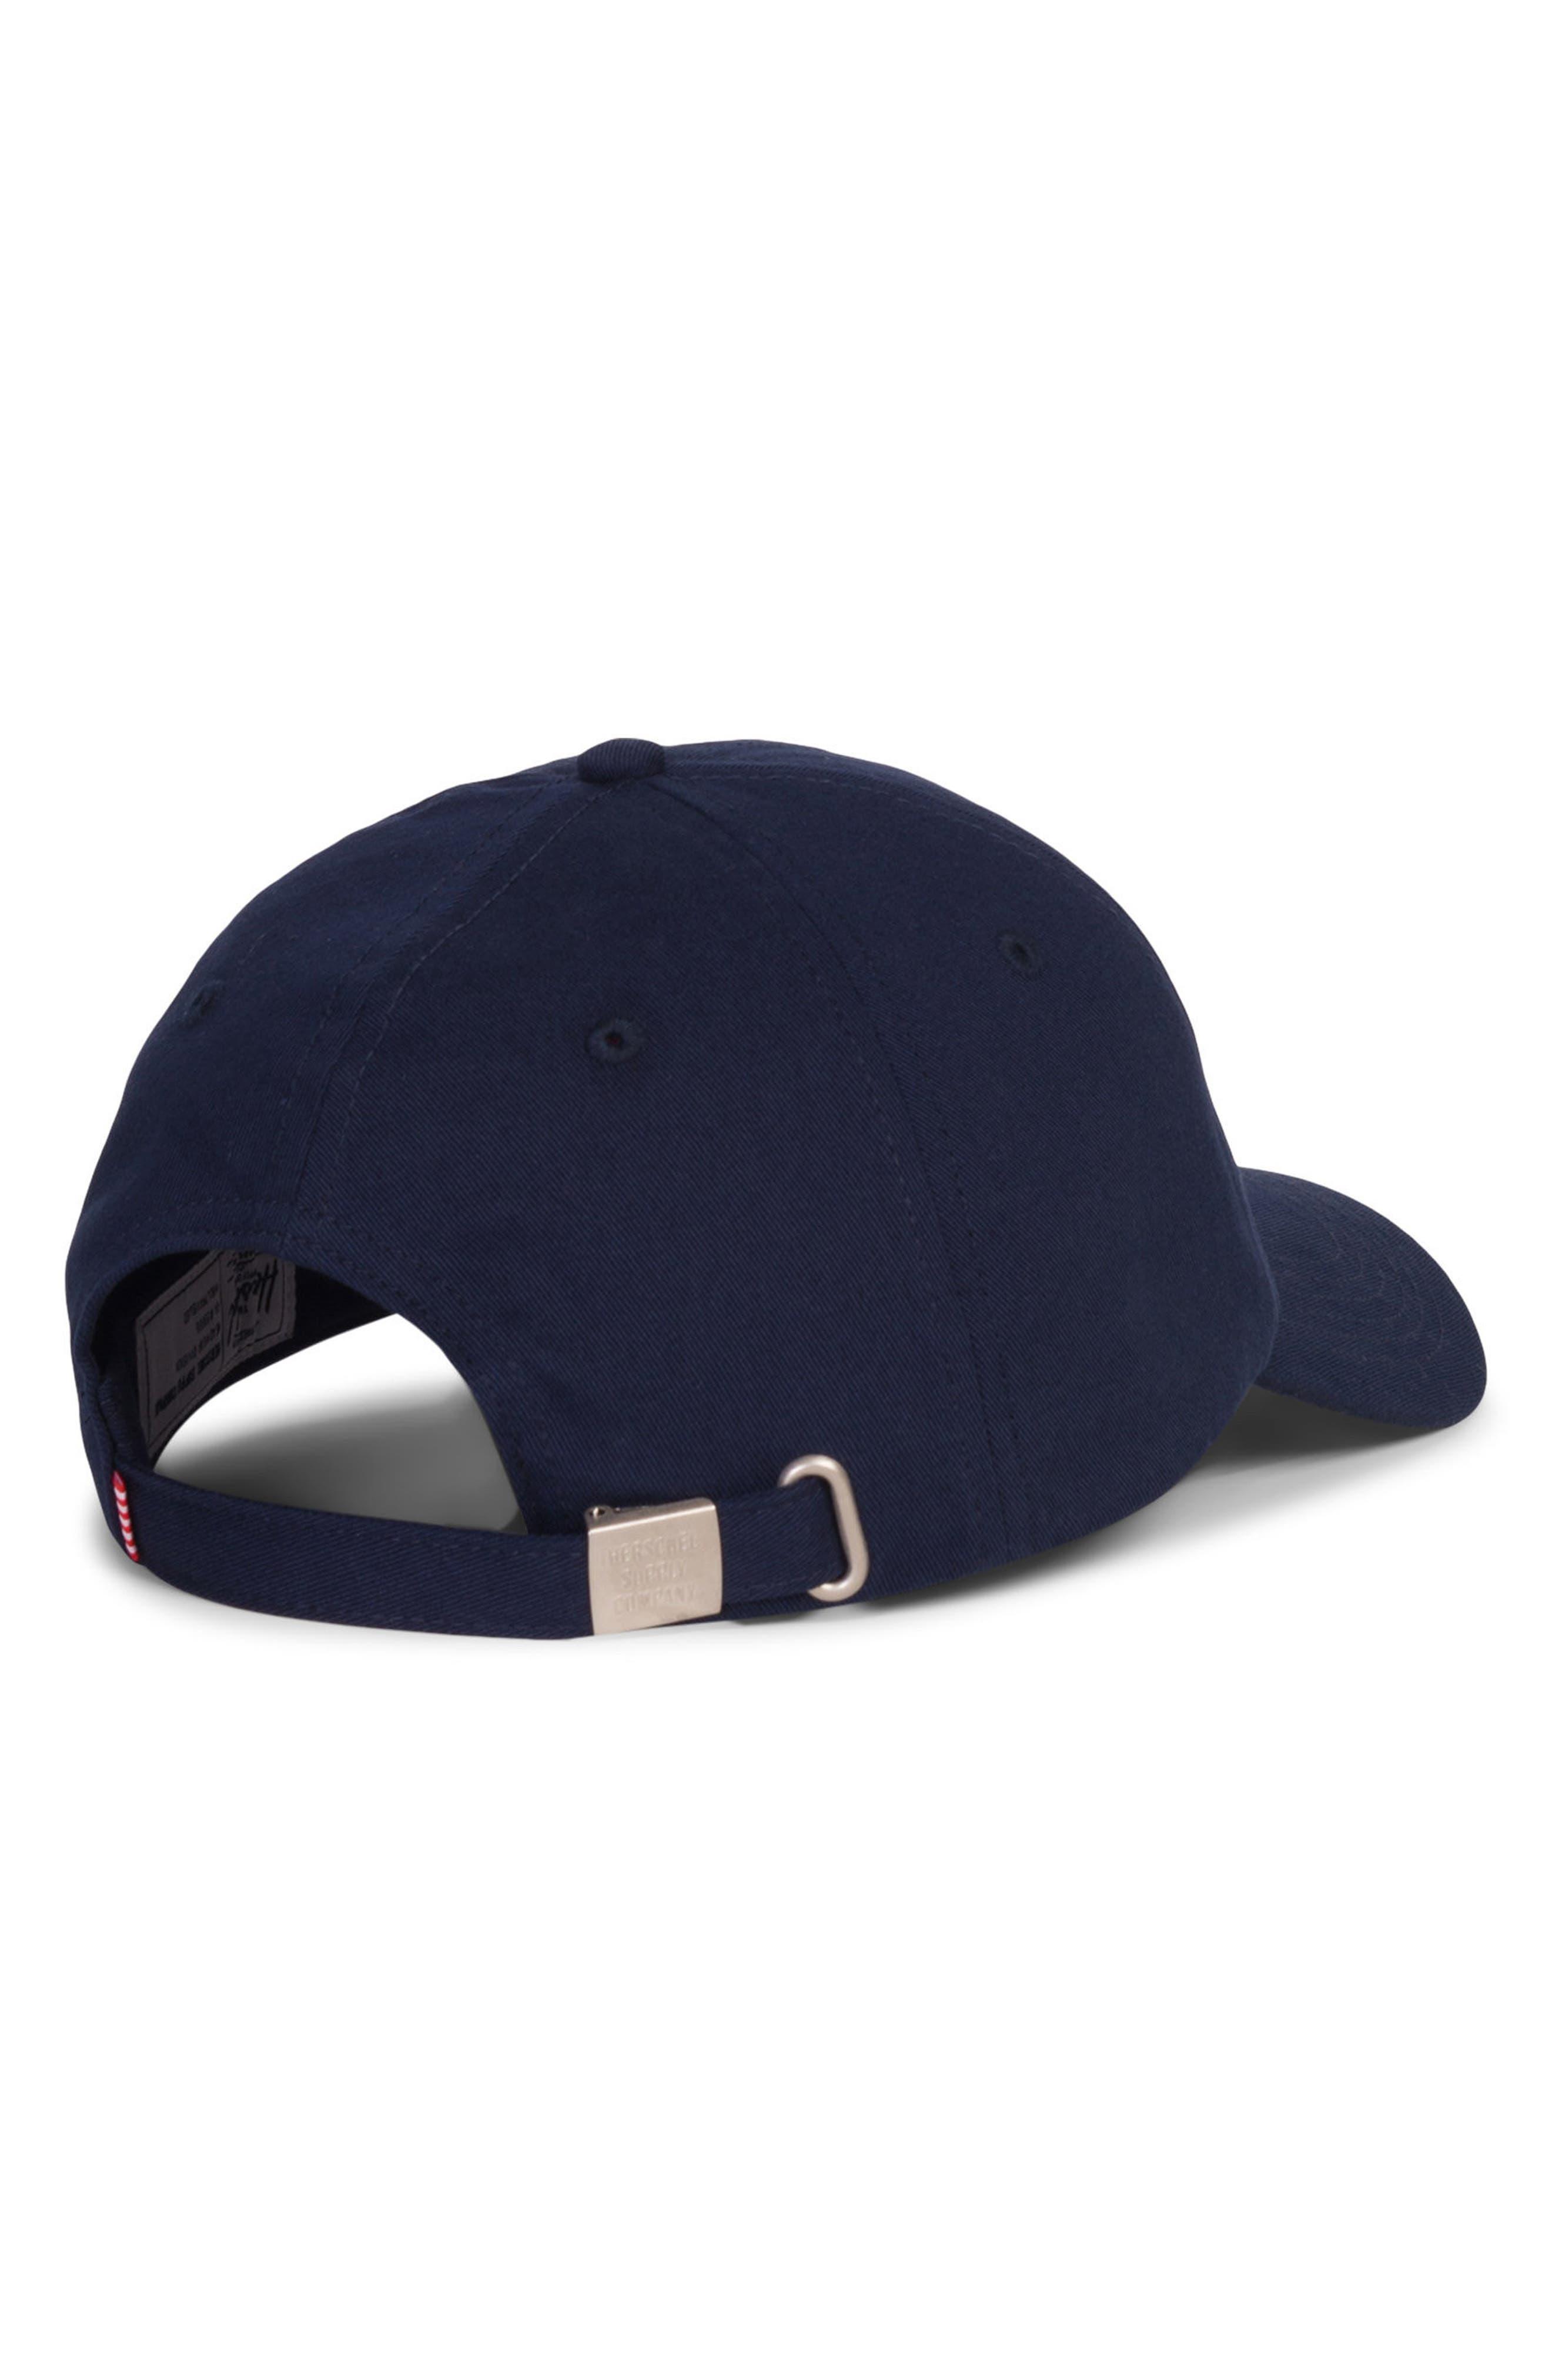 Sylas Baseball Cap,                             Alternate thumbnail 2, color,                             Navy